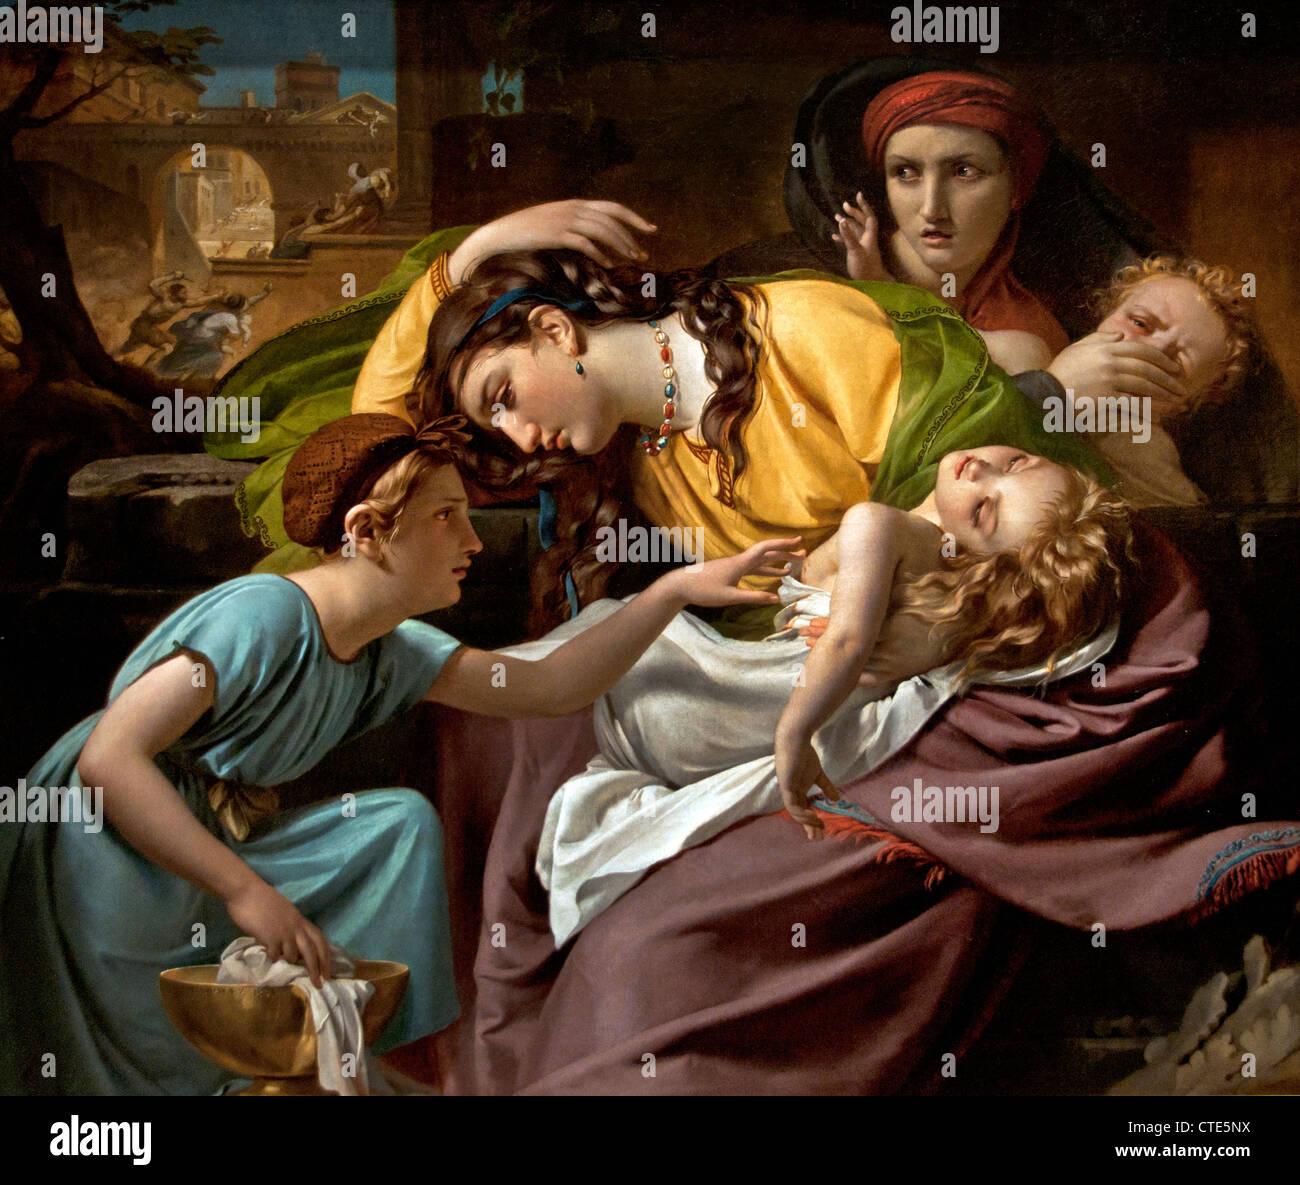 Le-Massaker des unschuldigen 1816 von Francois Joseph abbilden Belgien Belgien Stockfoto